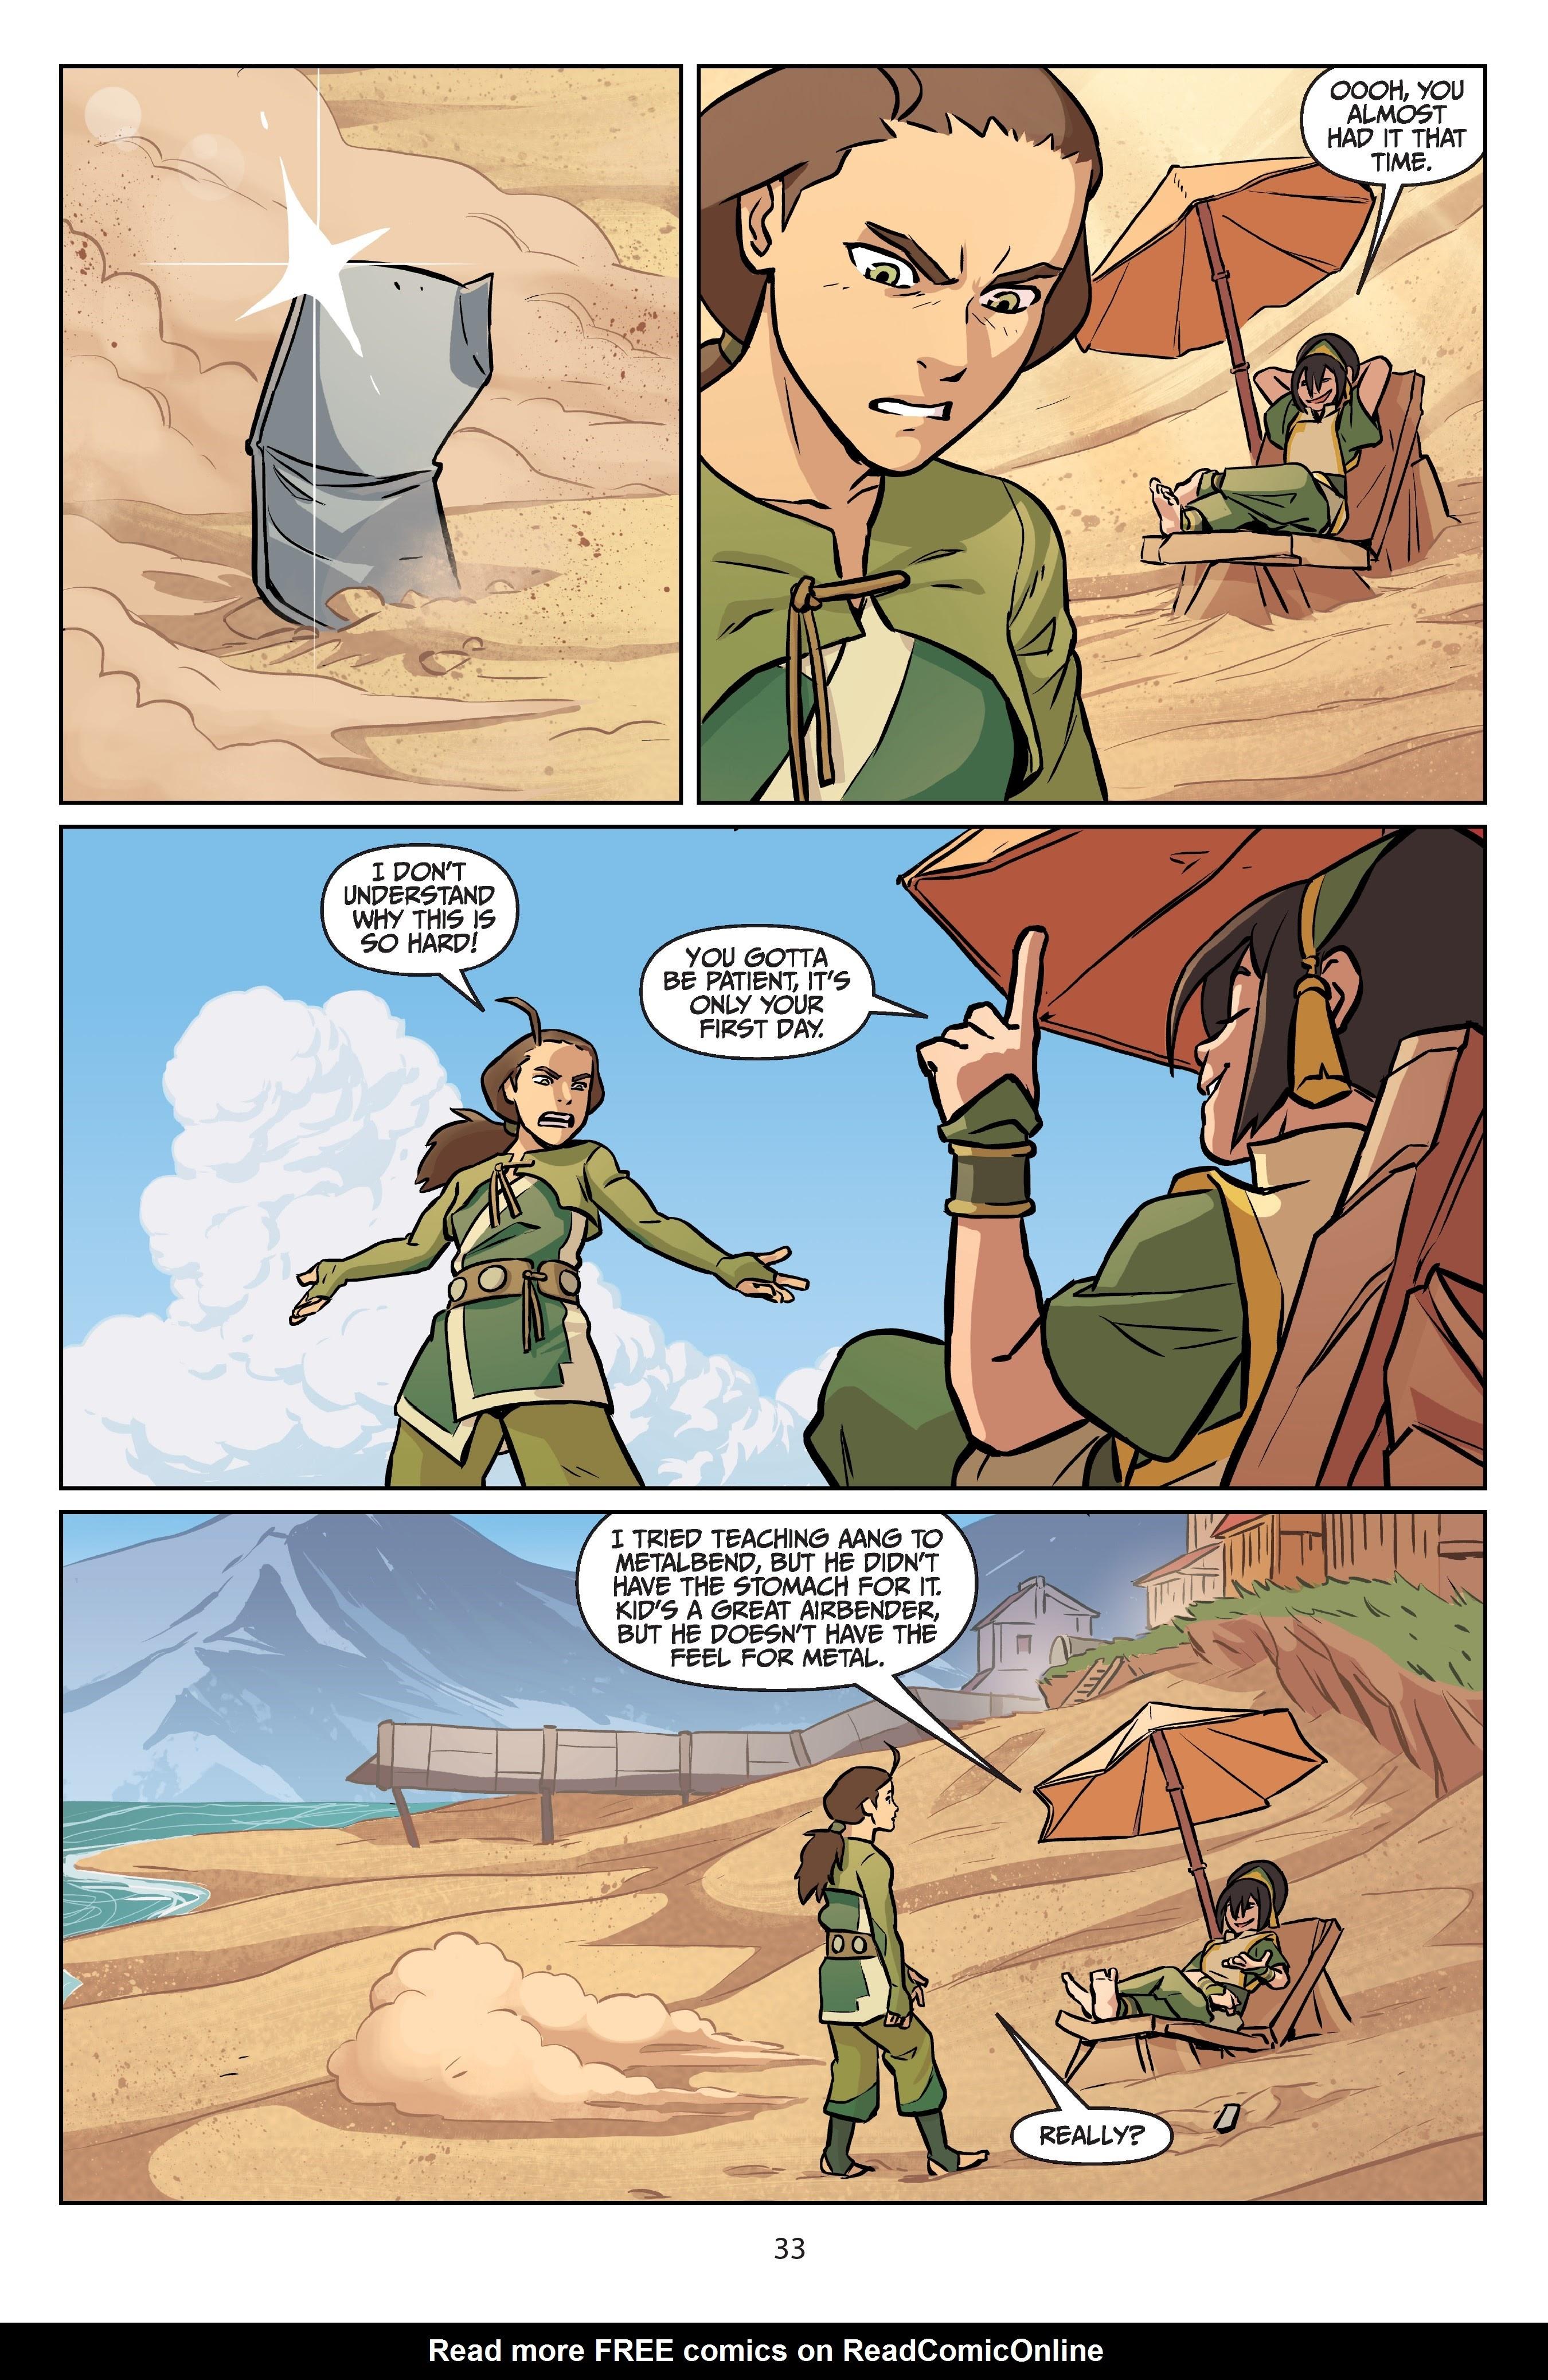 Nickelodeon Avatar: The Last Airbender - Imbalance TPB_2 Page 33